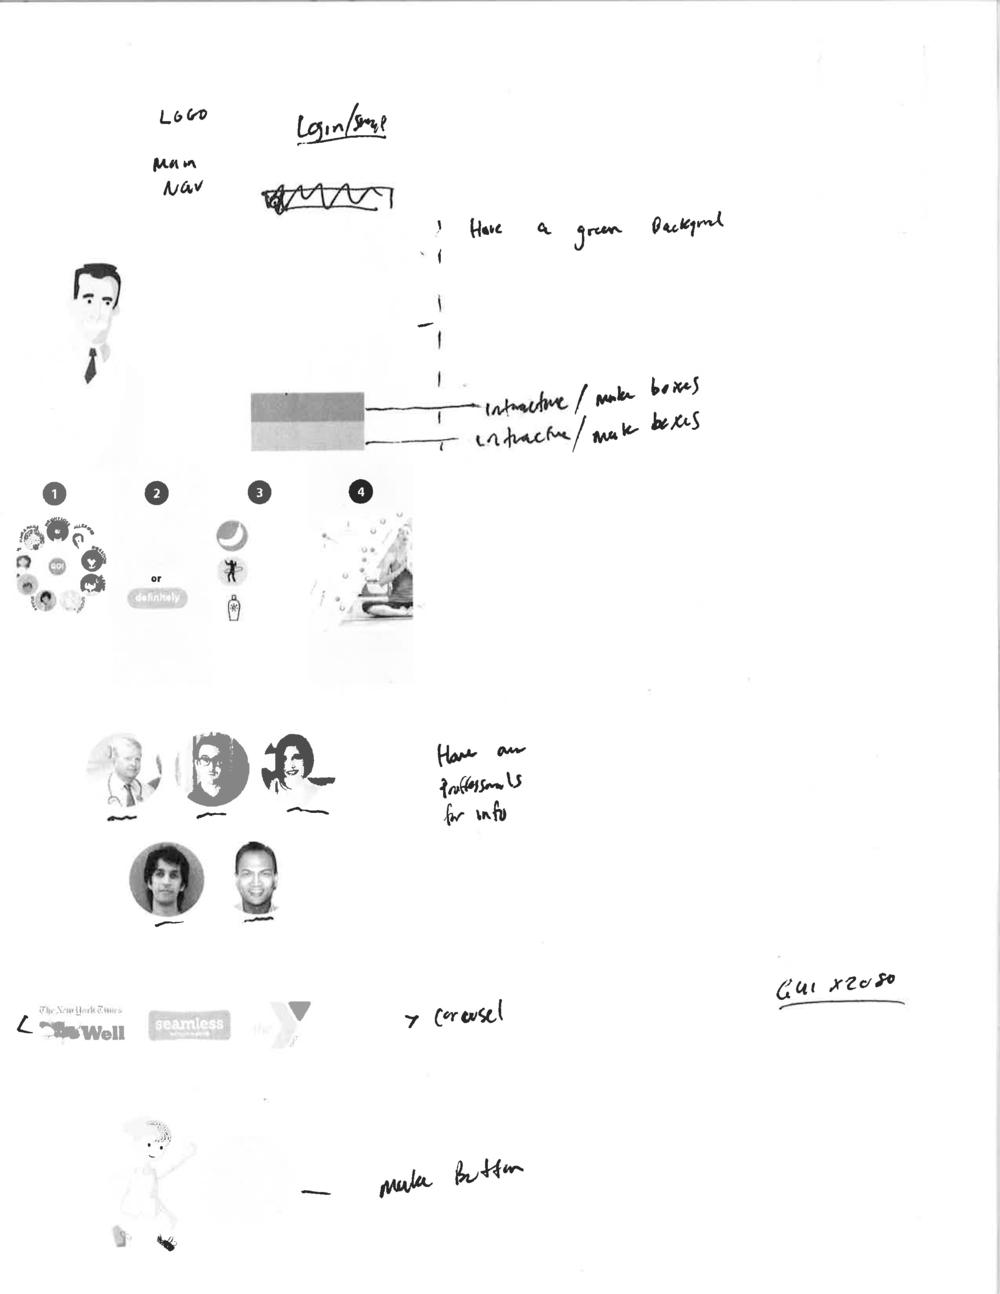 responsive-design-10.png